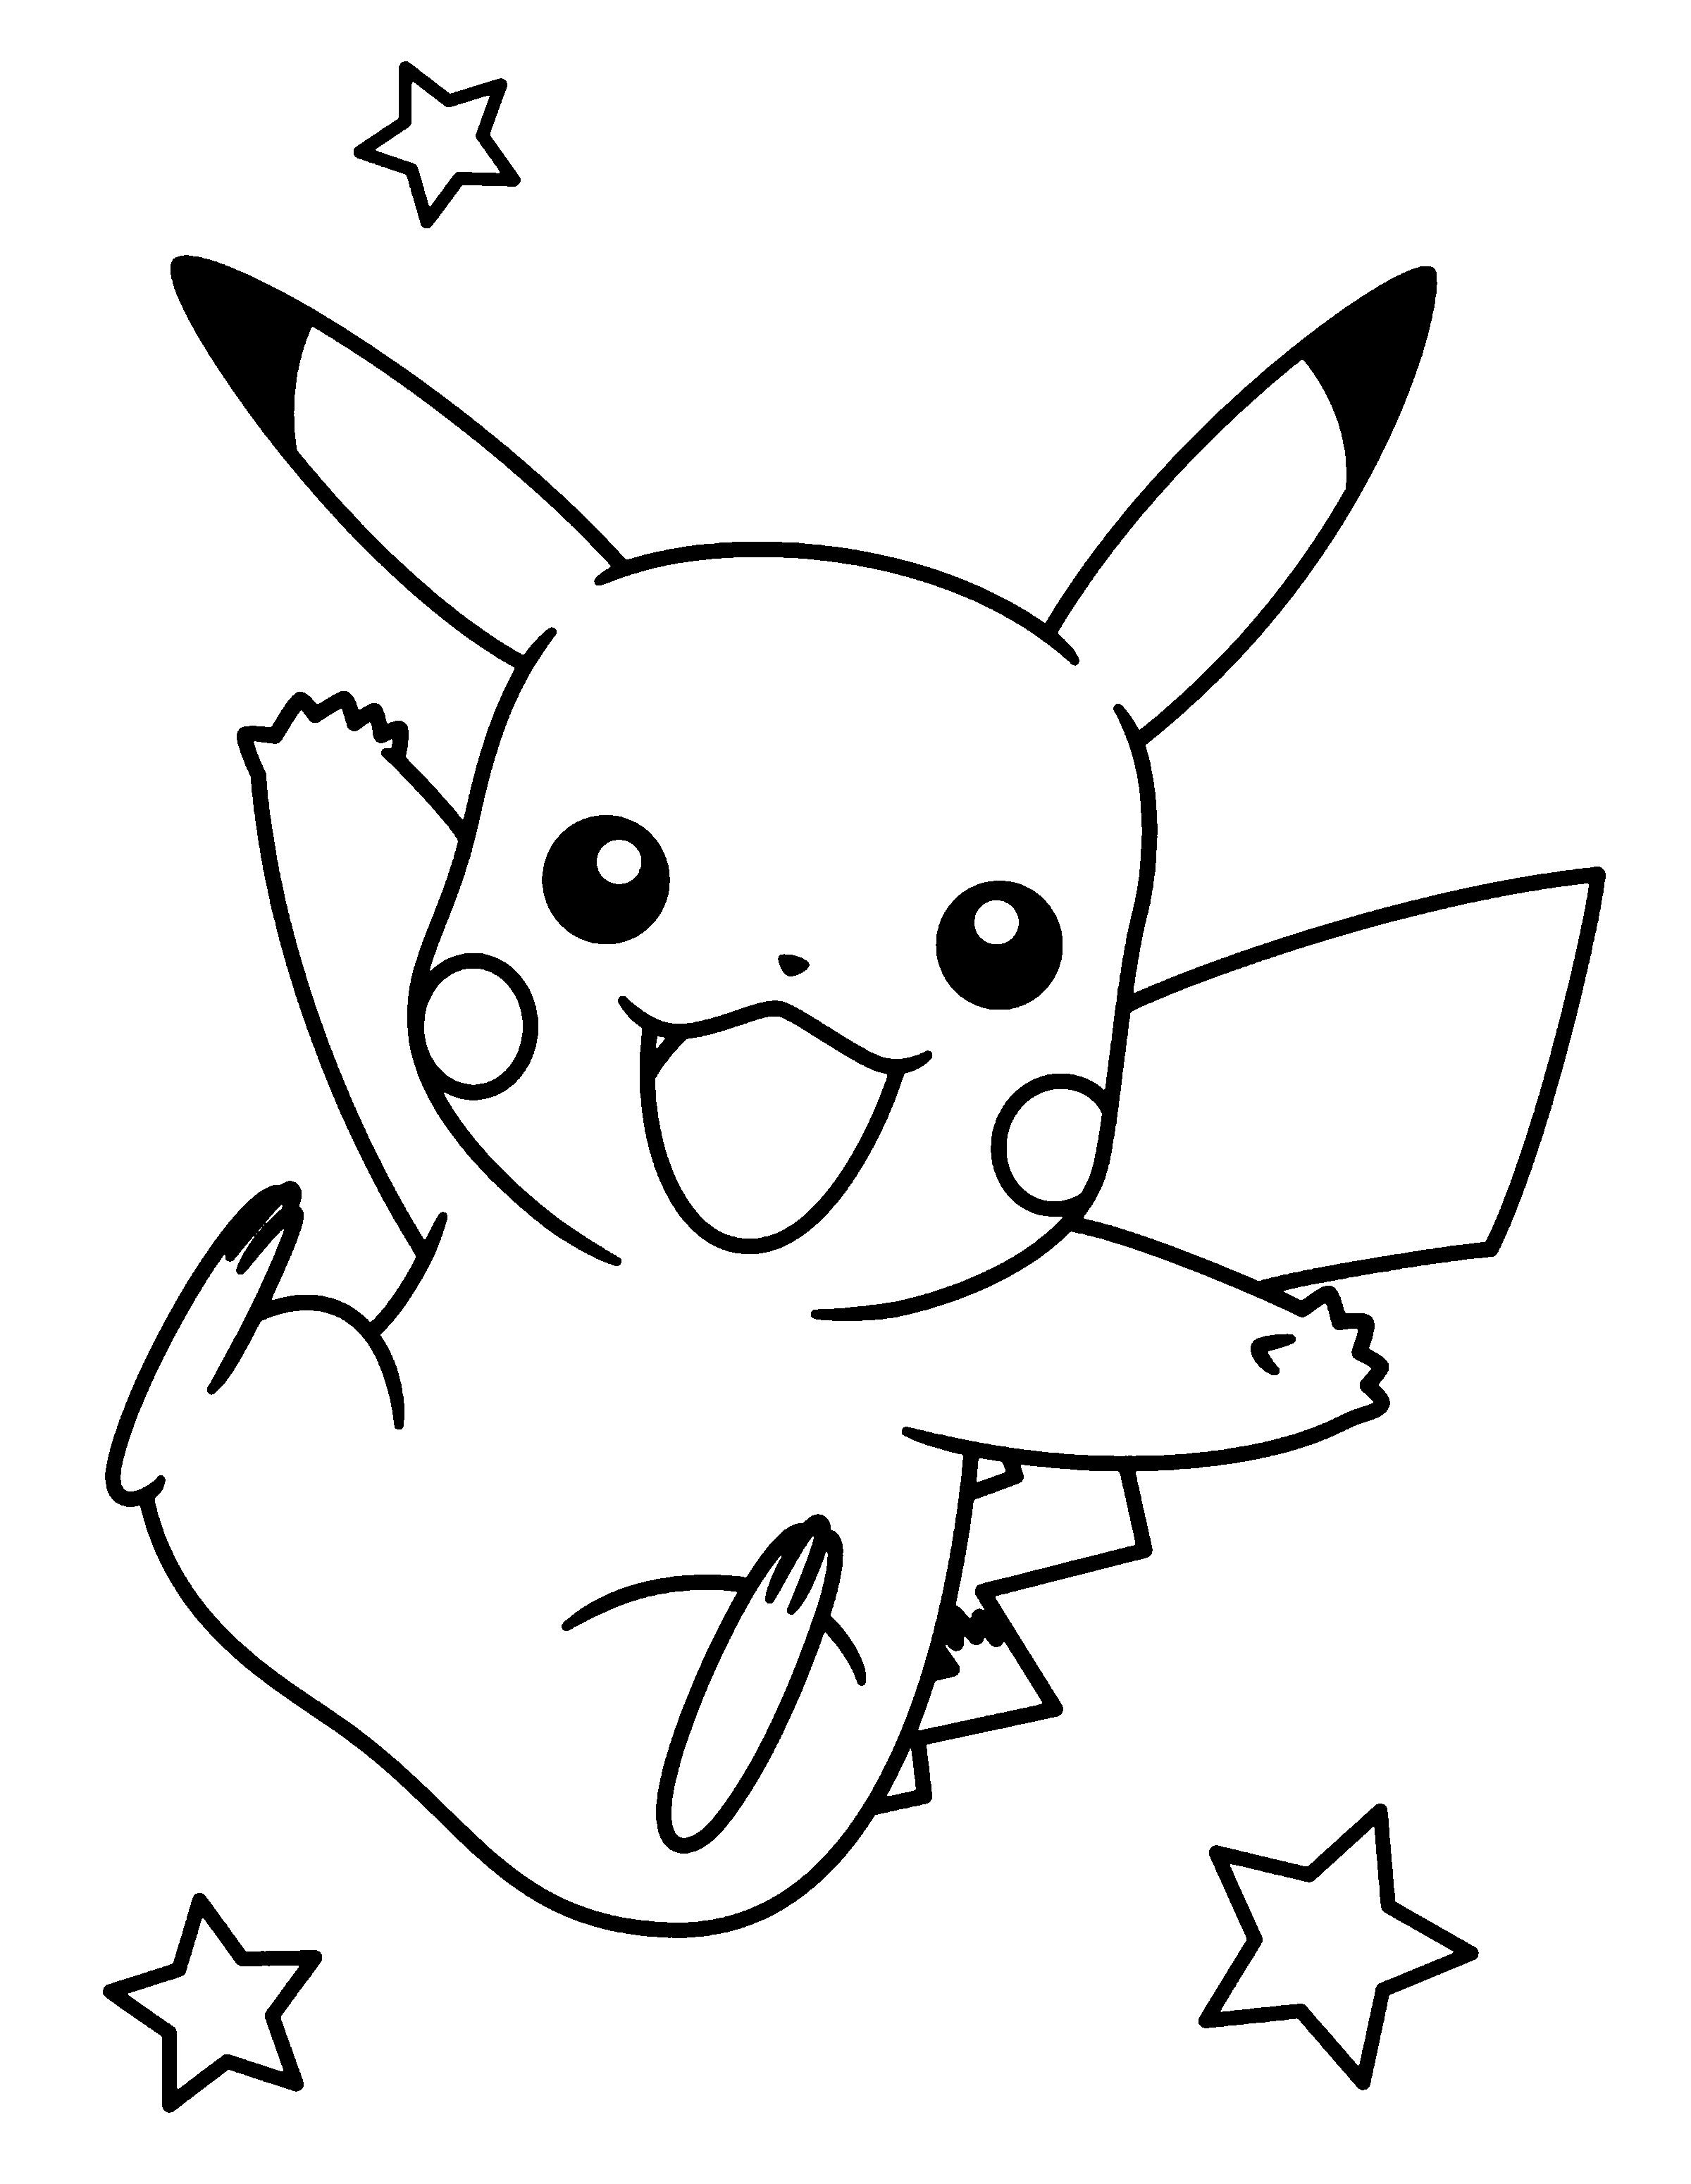 2400x3100 Pikachu Png Black And White Transparent Pikachu Black And White